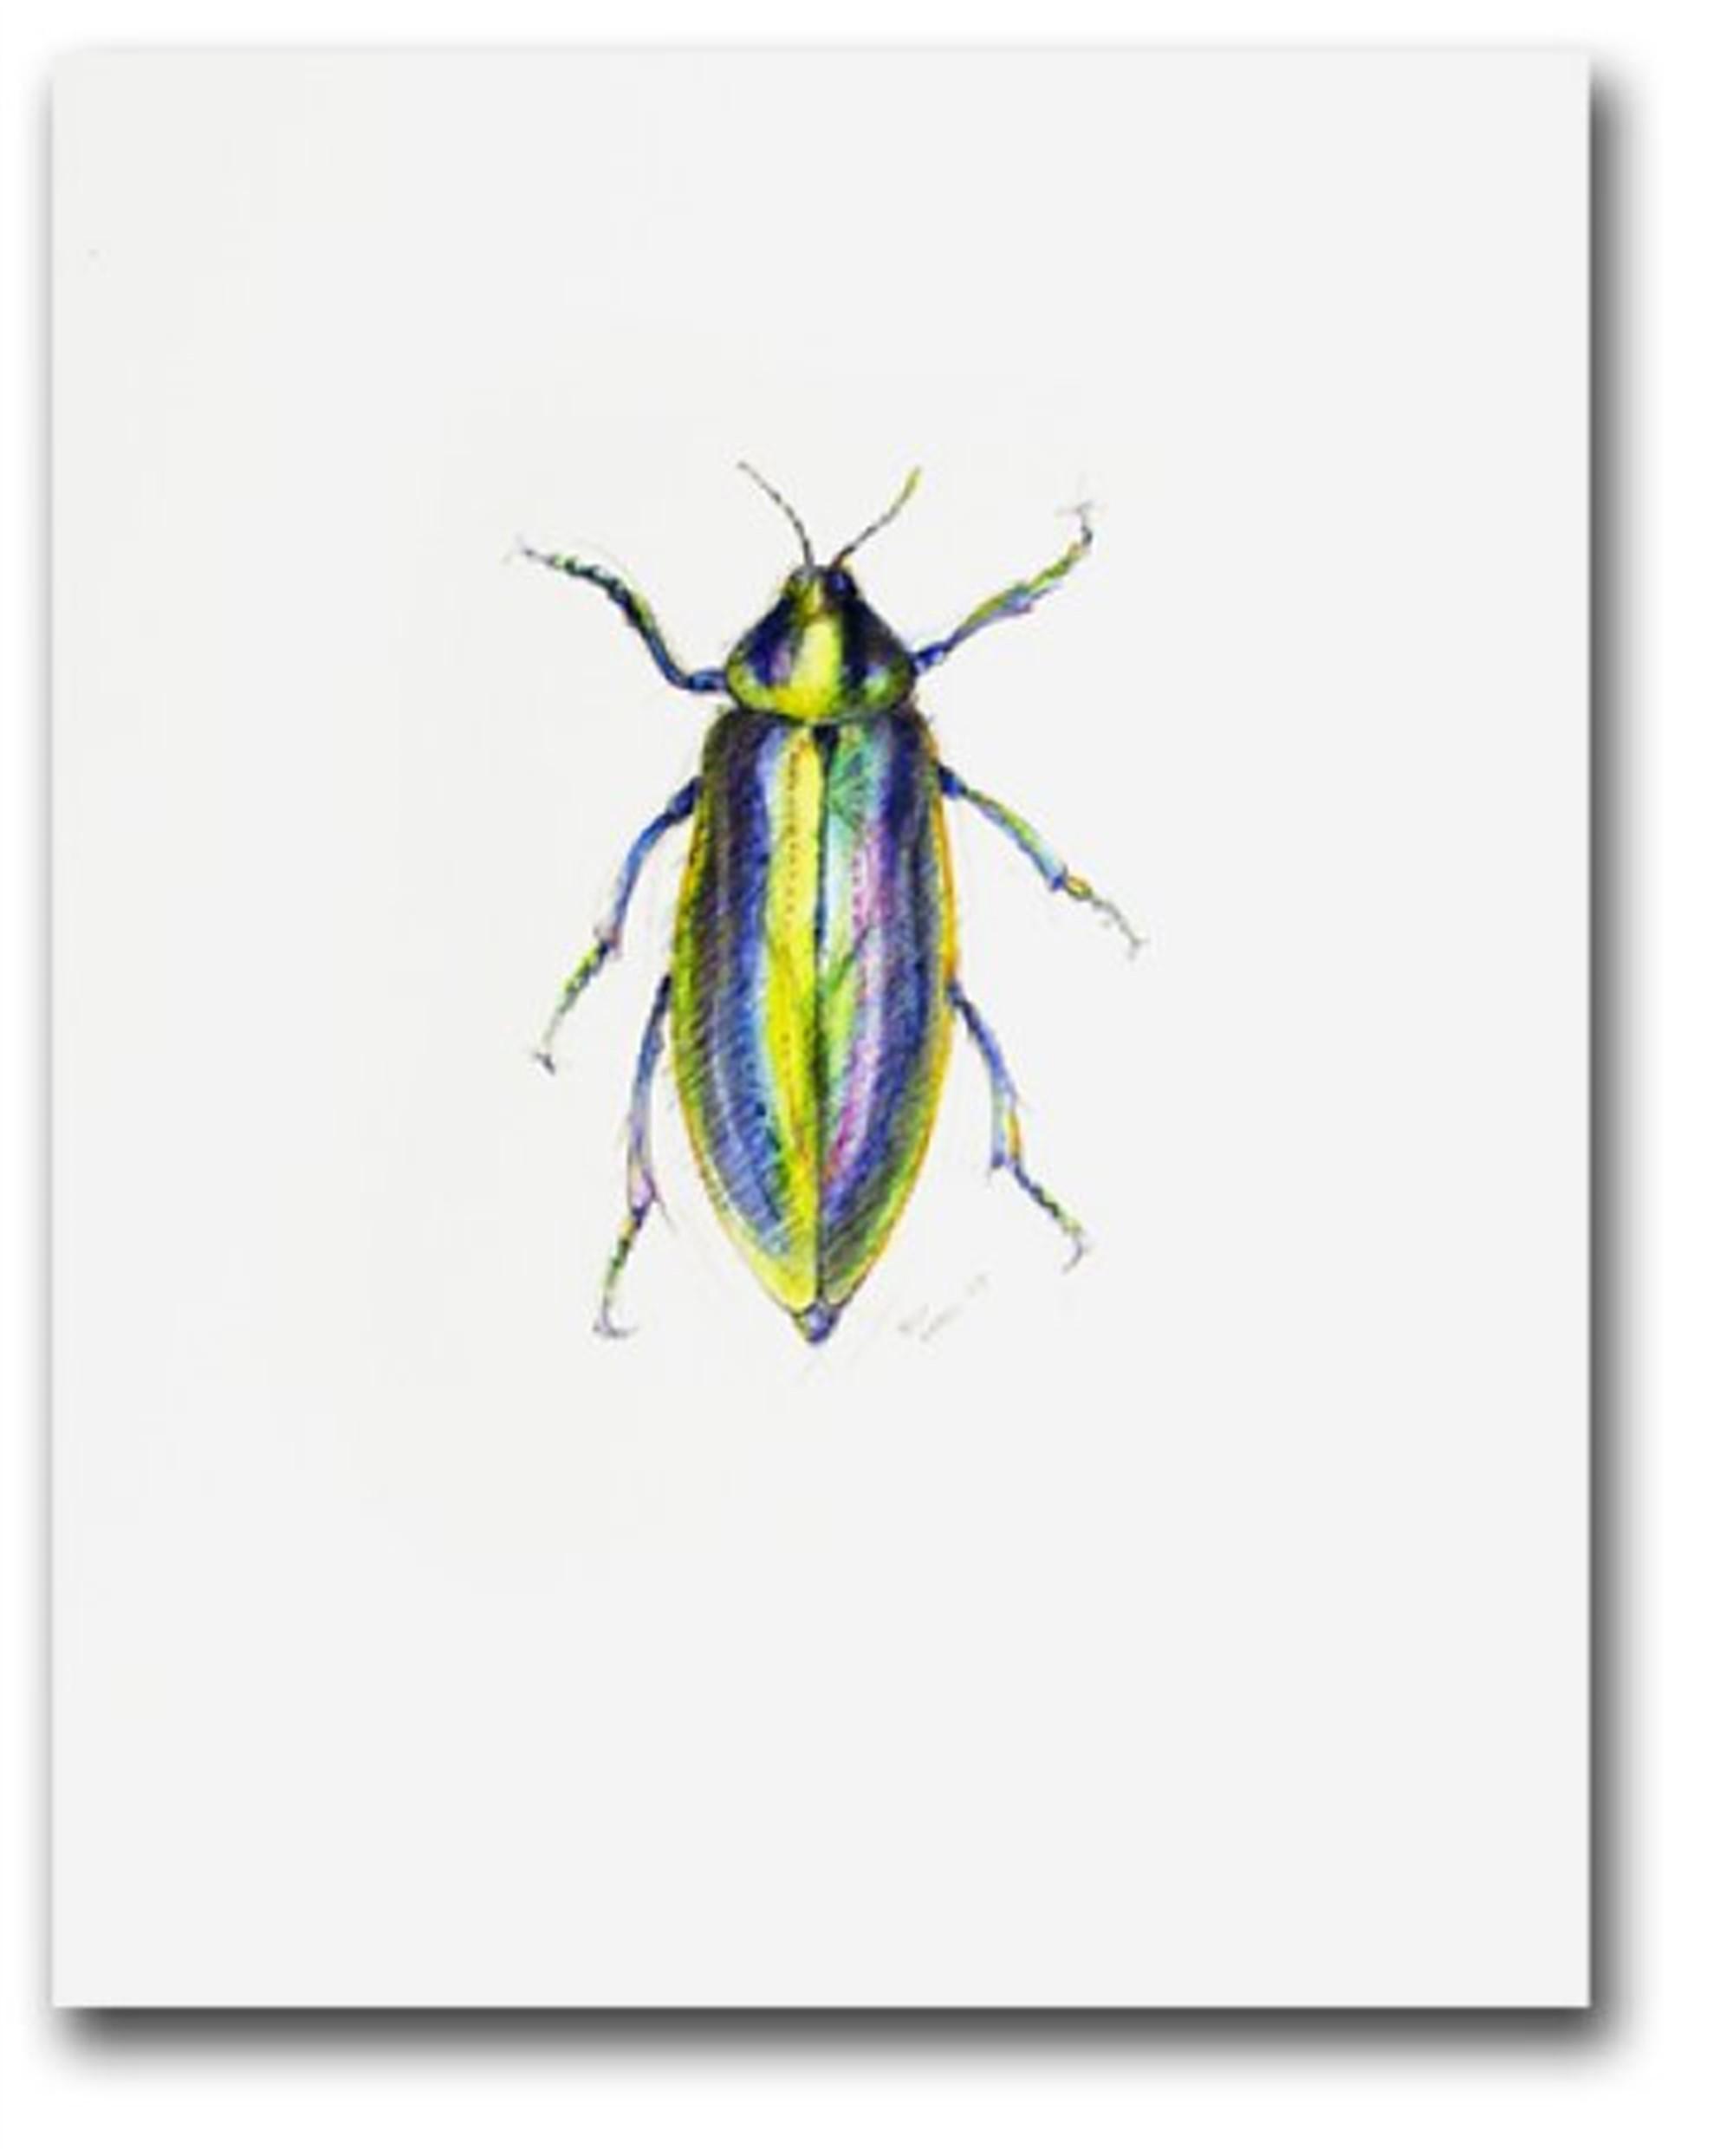 Euchroma Gigatea Beetle by Peter Hamel